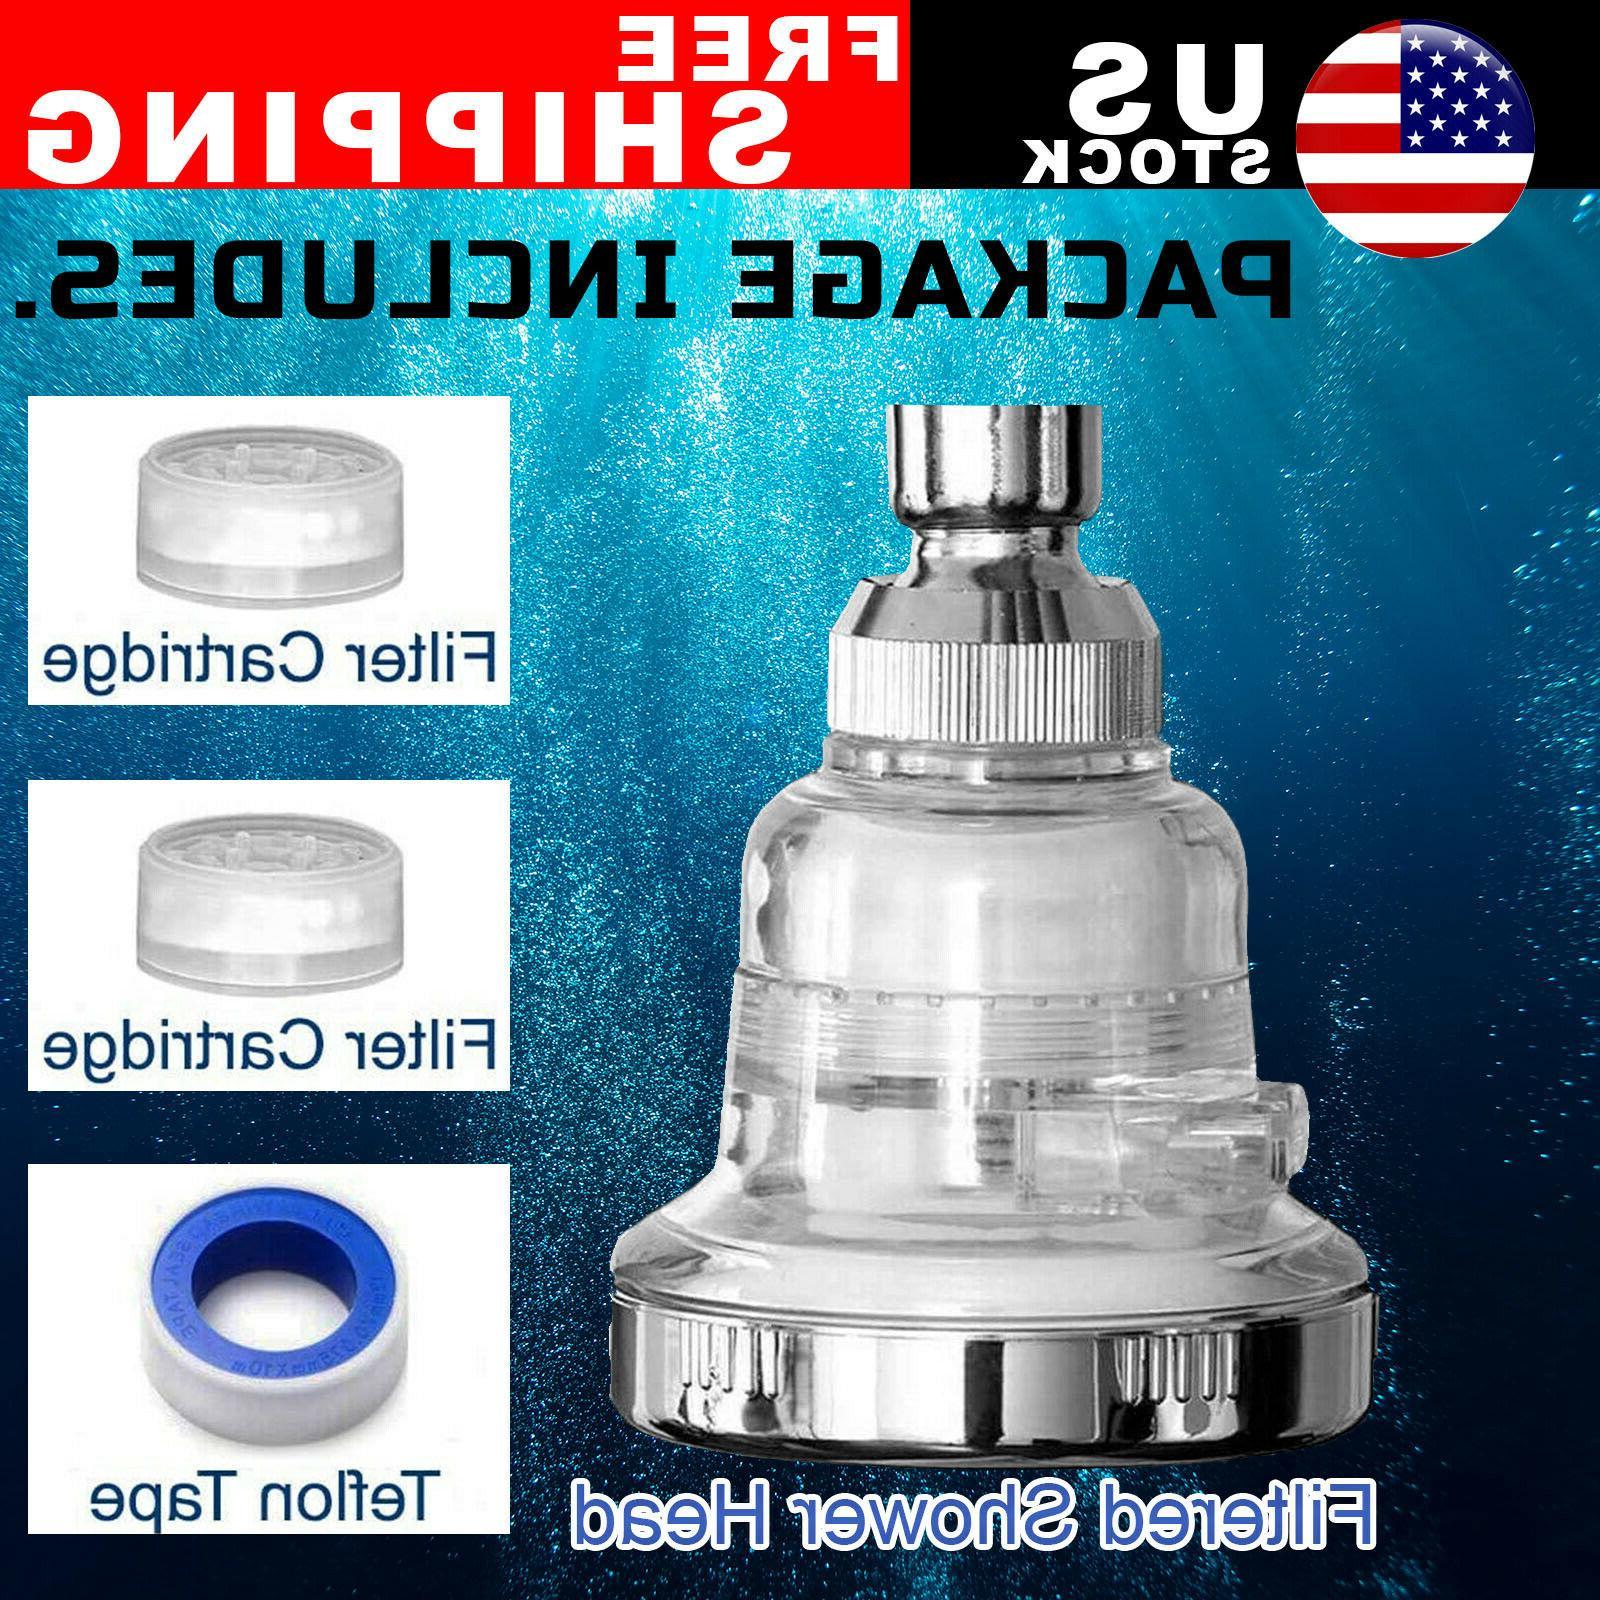 3 mode high pressure shower head filter